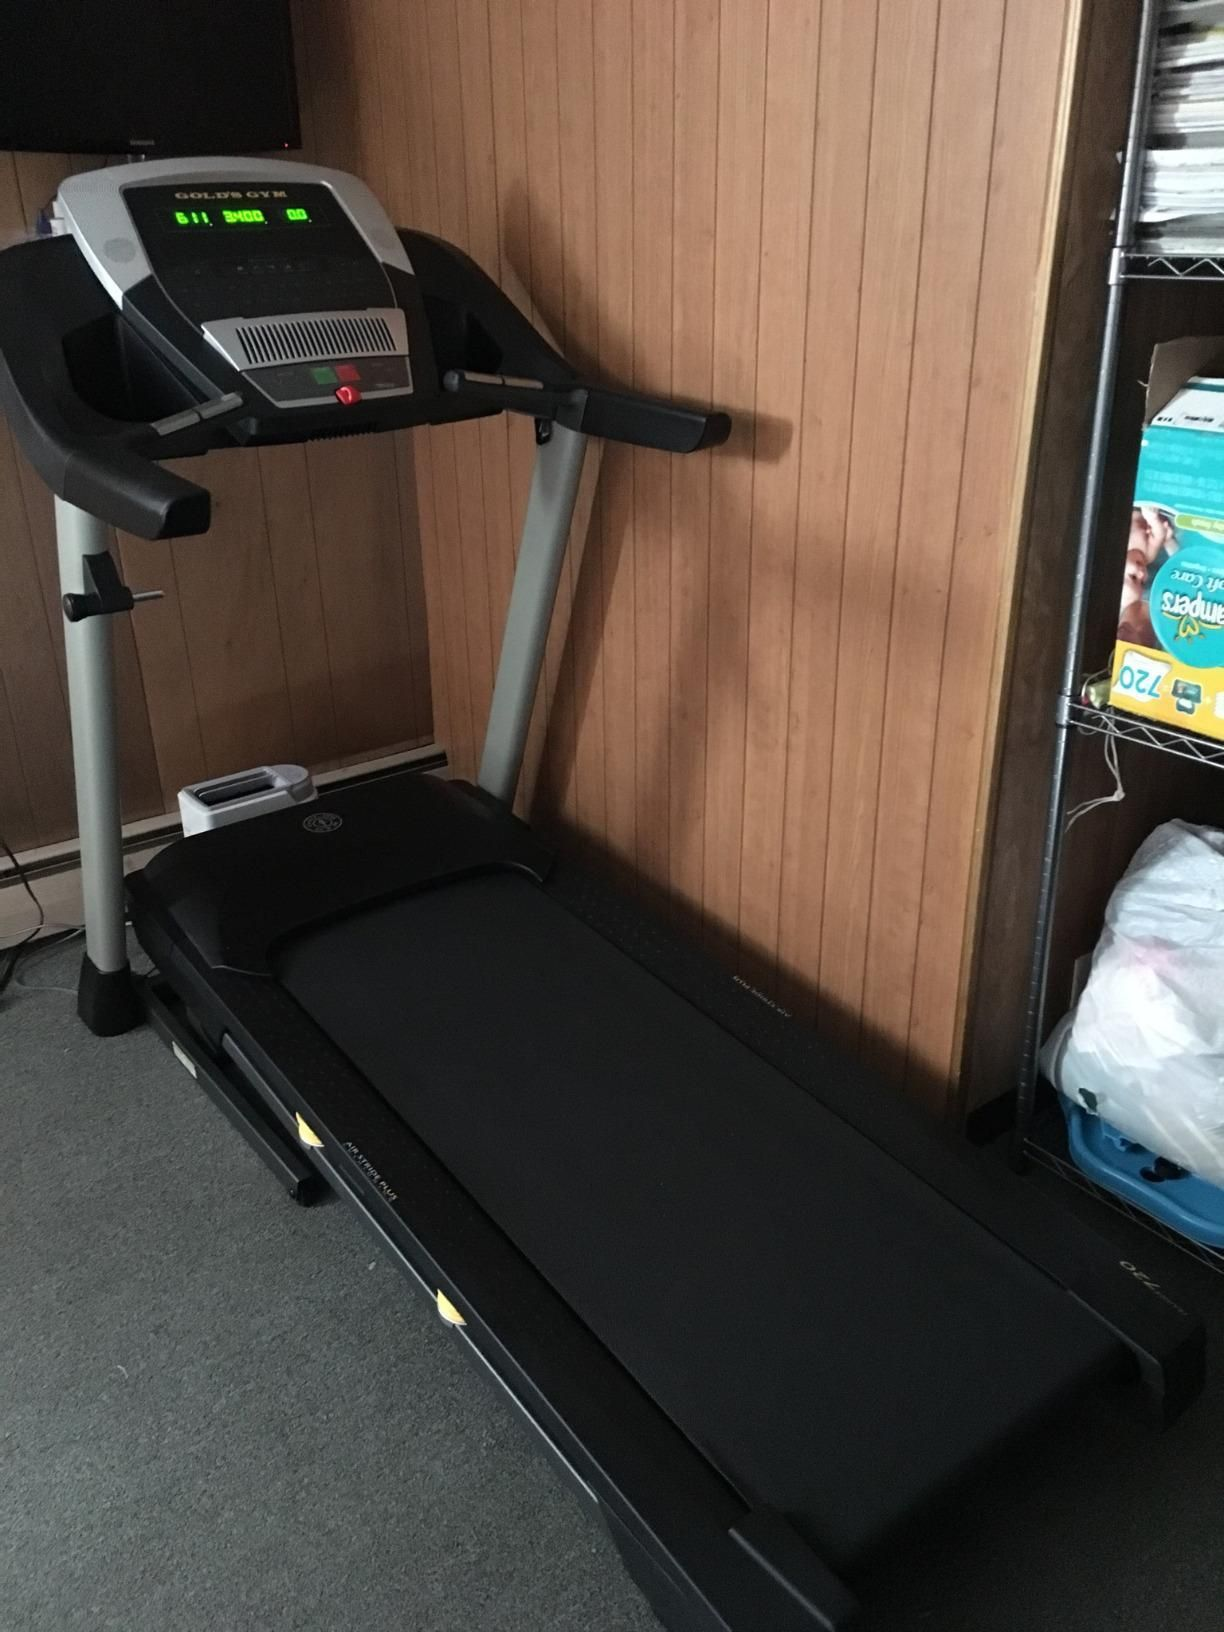 Best Treadmill Reviews In 2020 Good Treadmills Treadmill Treadmill Reviews